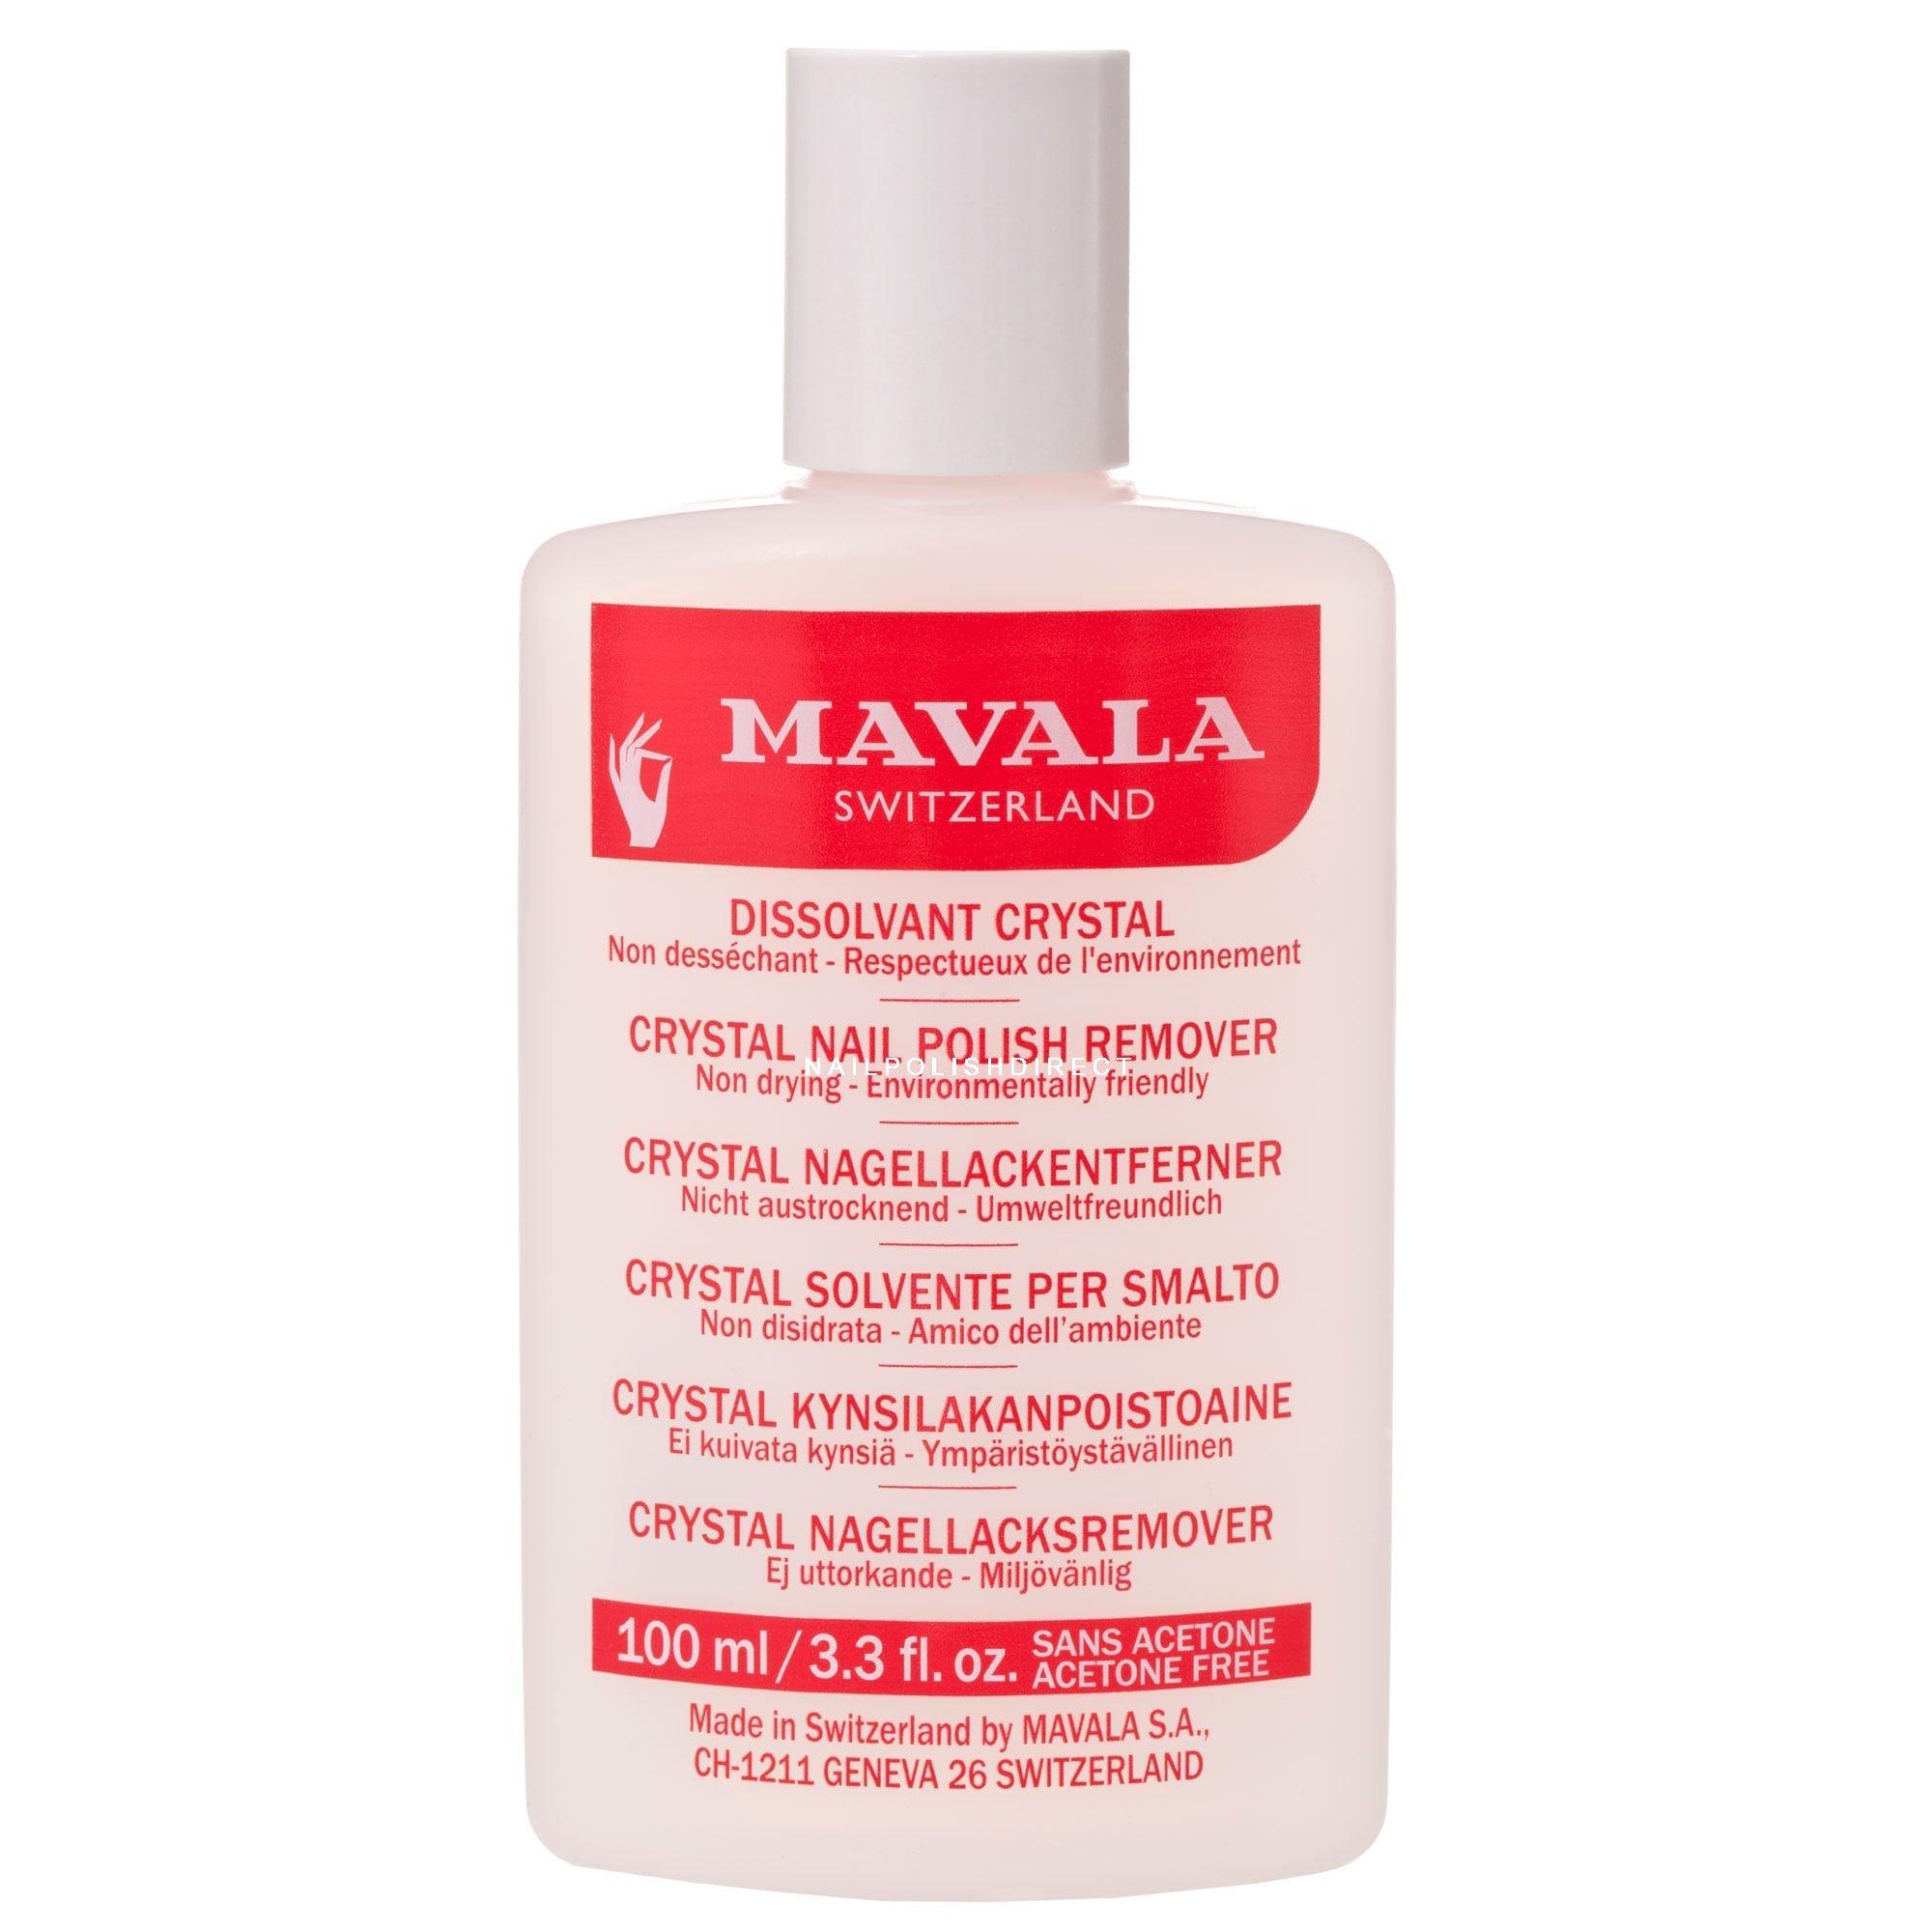 Mavala Crystal Nail Polish Remover (100ml)